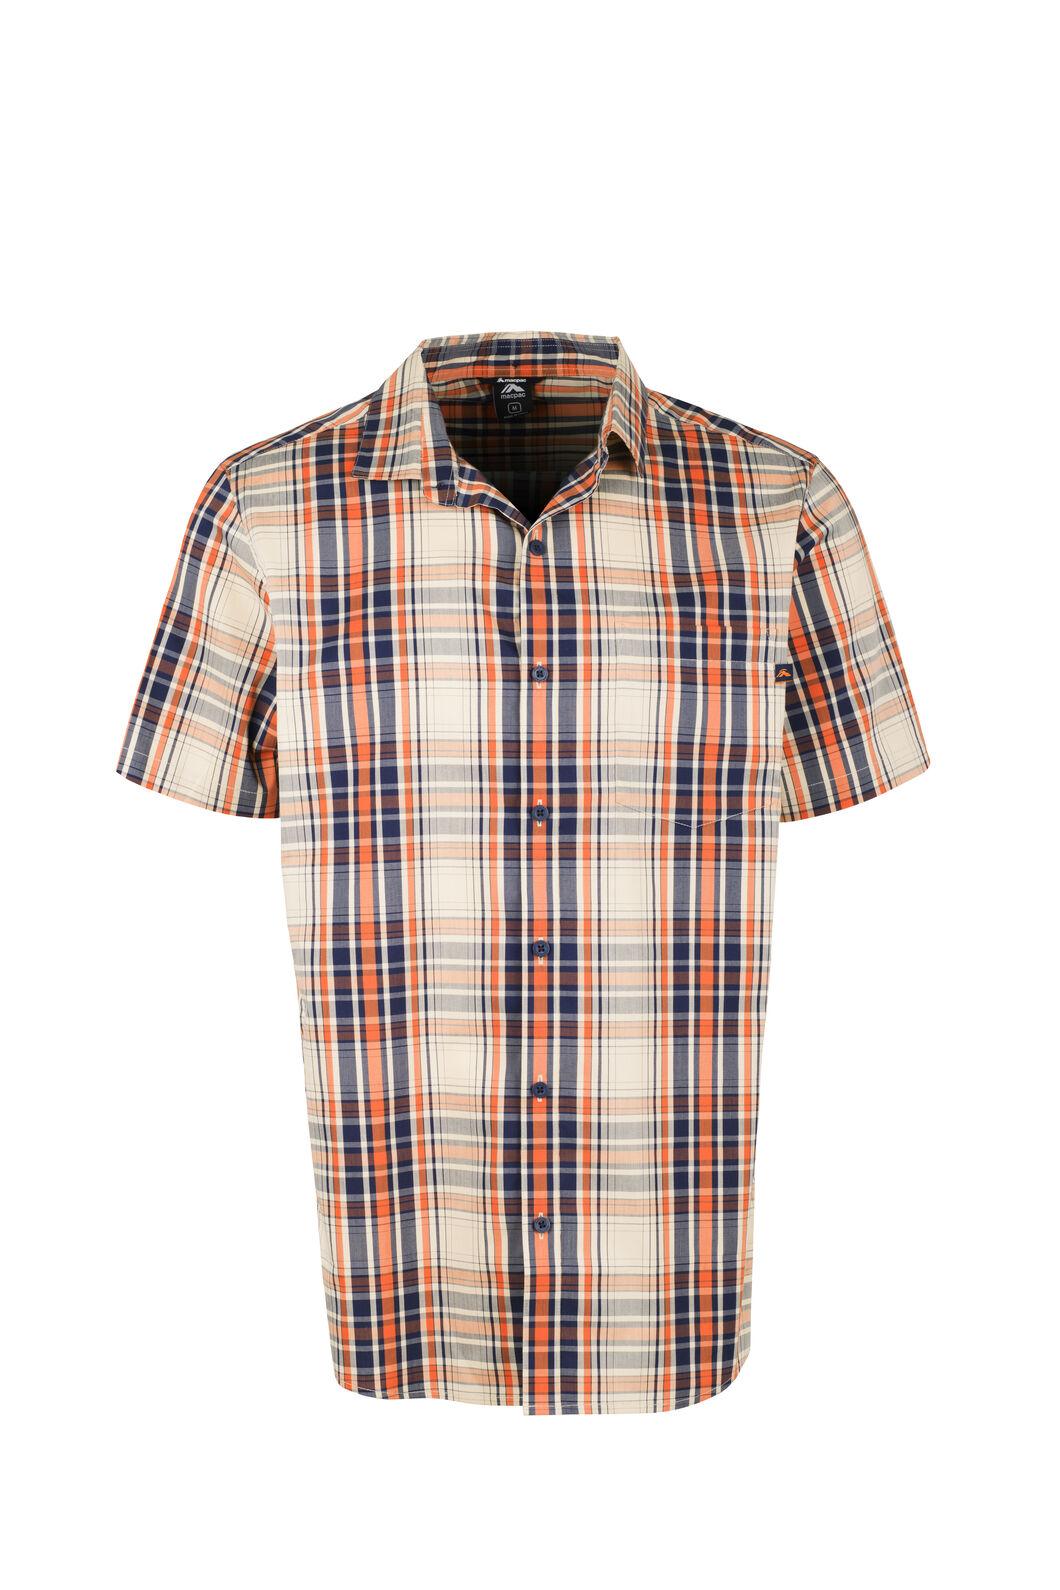 Macpac Crossroad Short Sleeve Shirt - Men's, Burnt Orange, hi-res